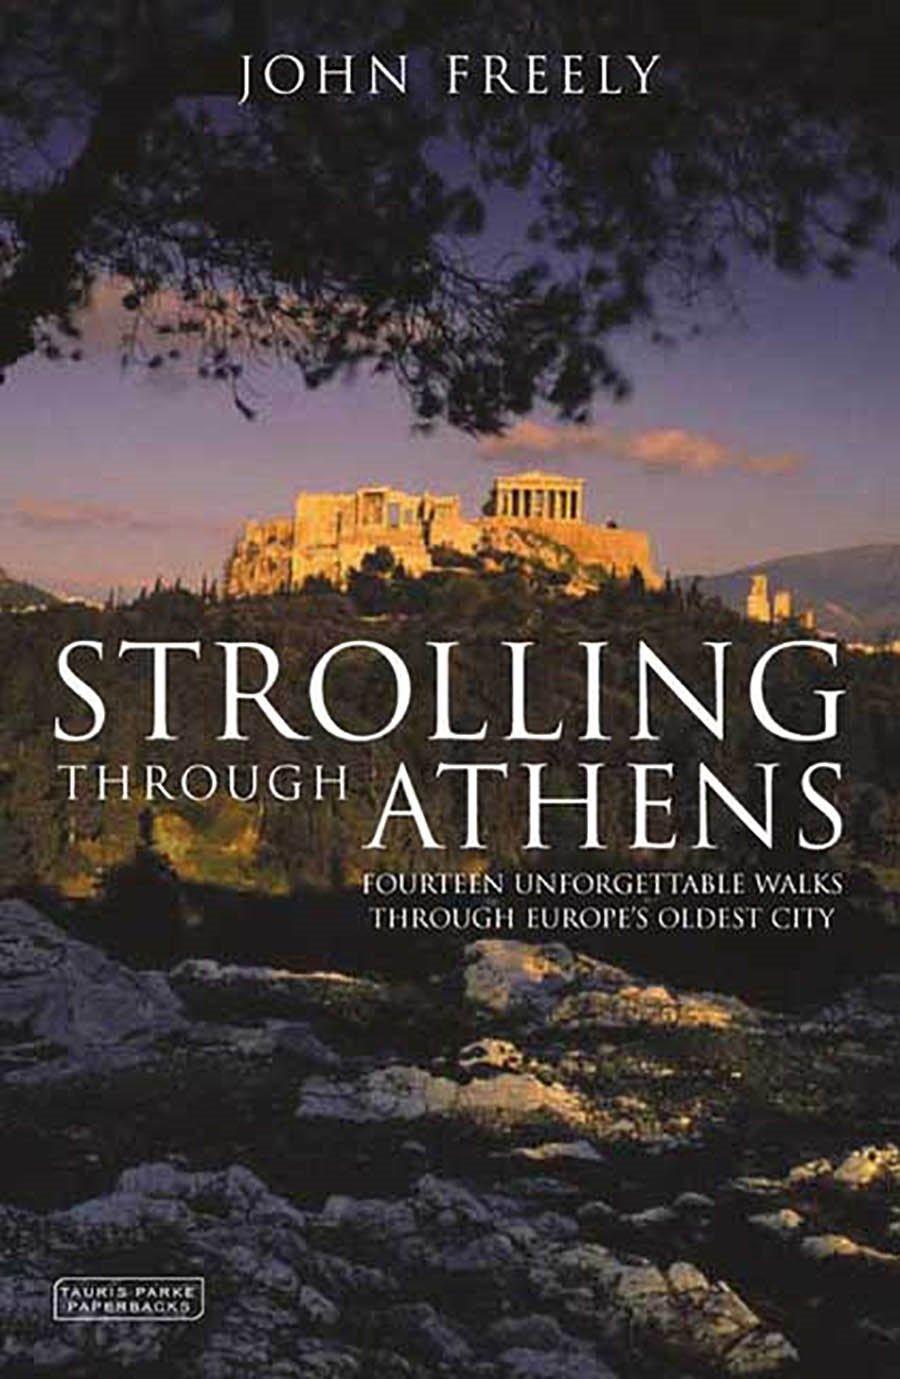 Strolling Through Athens: Fourteen Unforgettable Walks through Europe's Oldest City (Tauris Parke Paperbacks) PDF